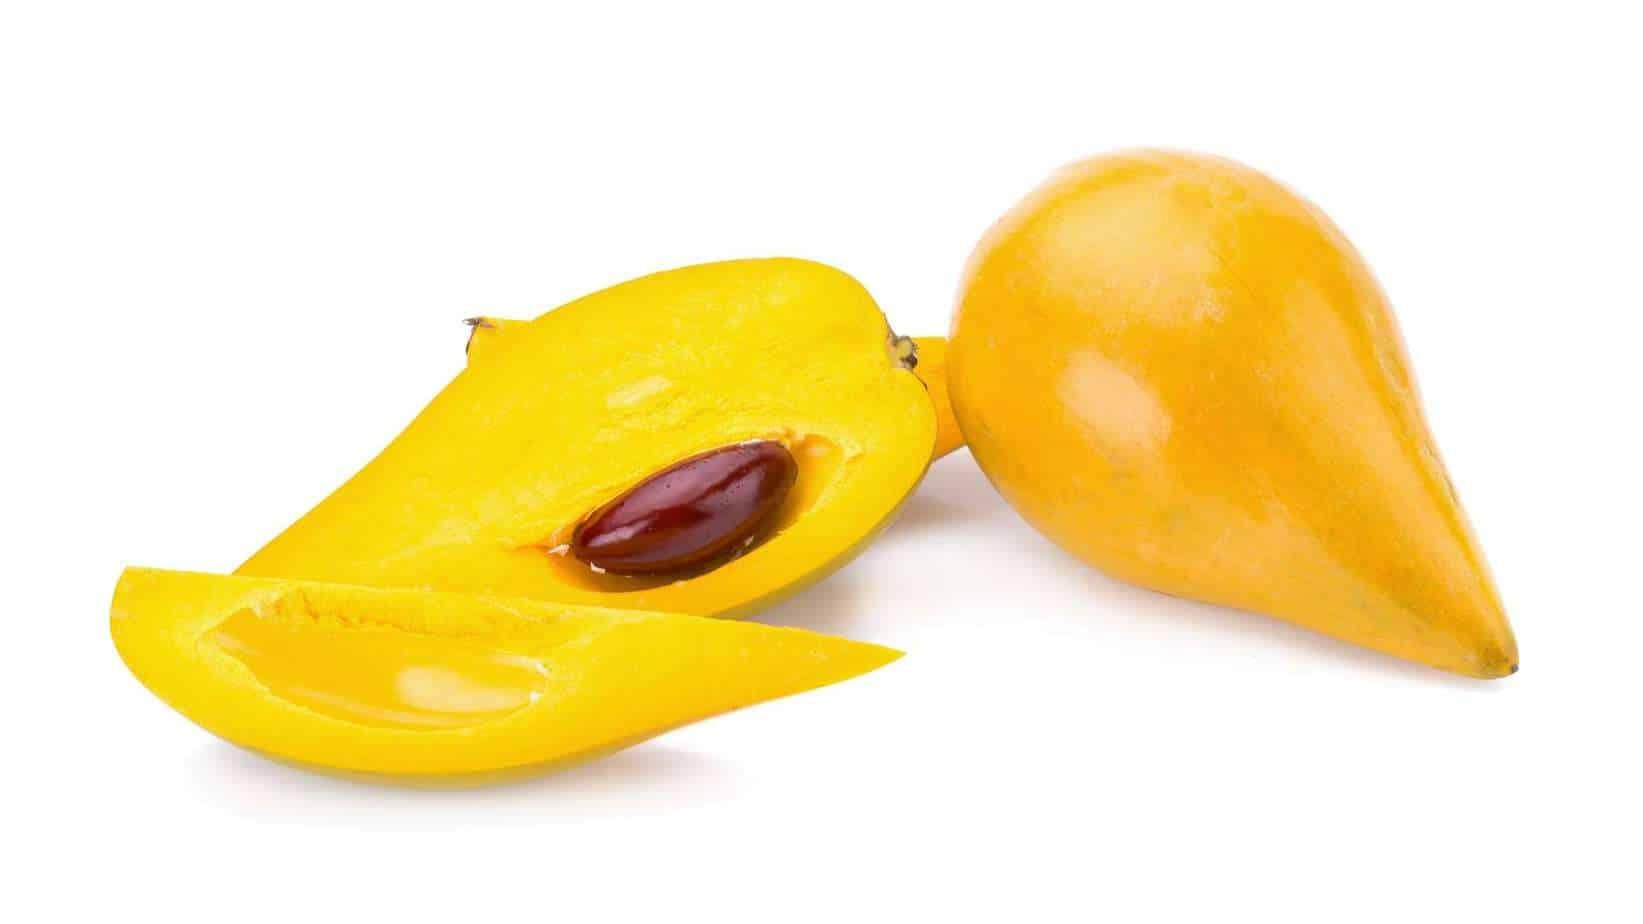 Yellow Sapote